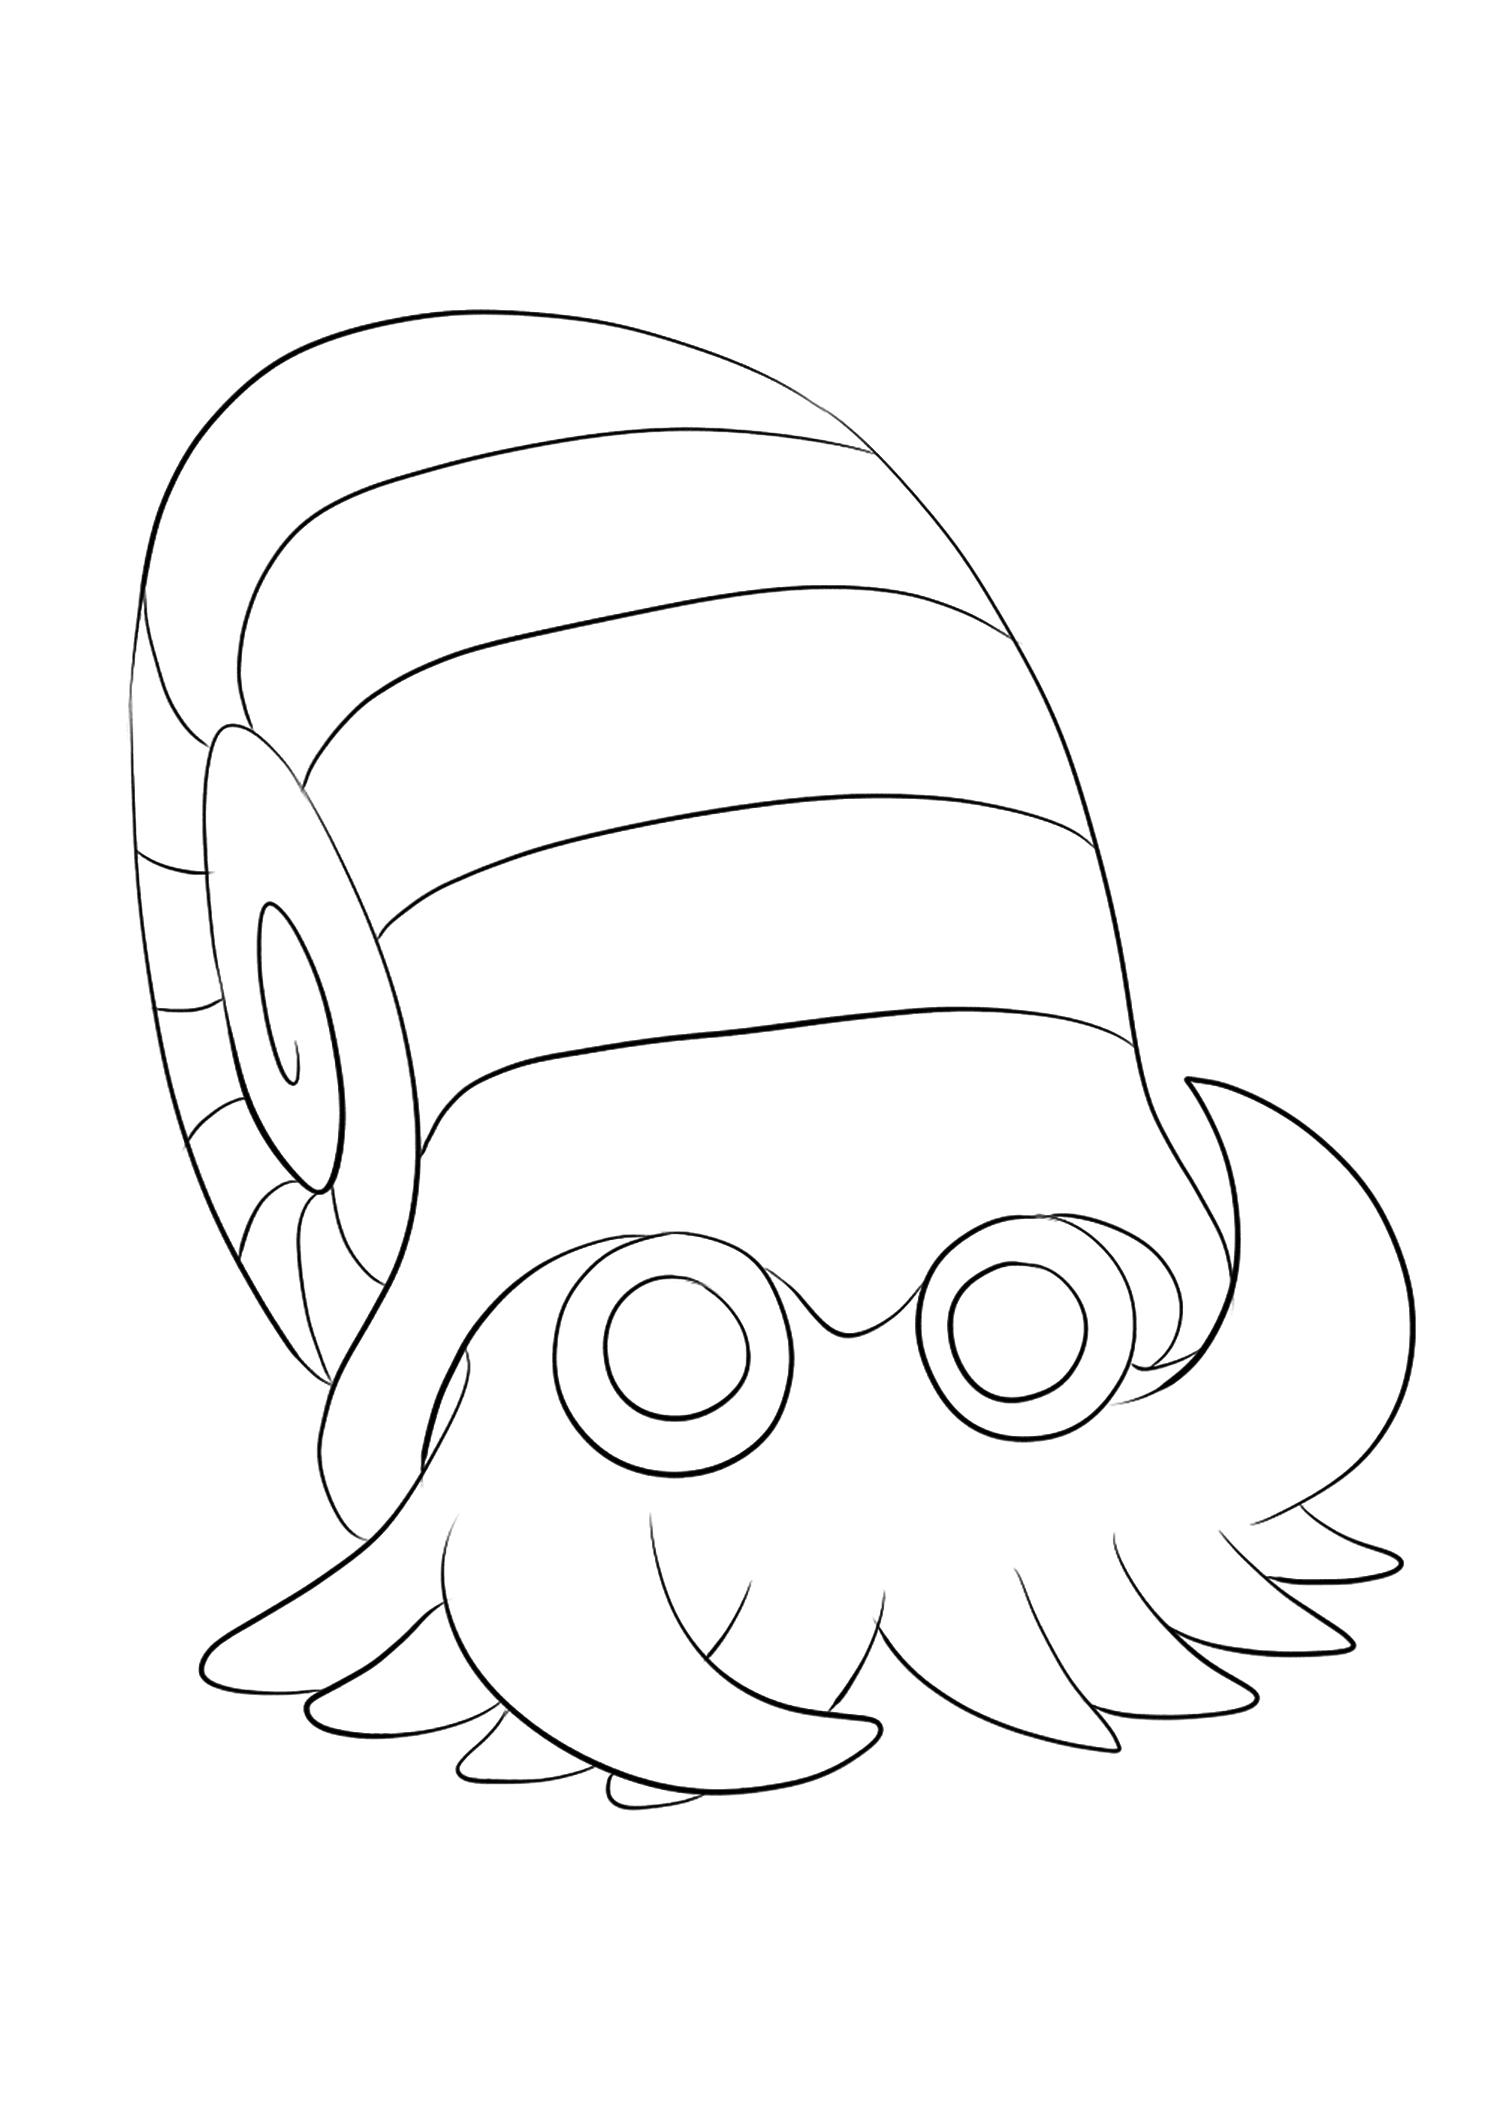 Amonita (No.138)Coloriage de Amonita (Omanyte), Pokémon de Génération I, de type : Roche et EauOriginal image credit: Pokemon linearts by Lilly Gerbil on Deviantart.Permission:  All rights reserved © Pokemon company and Ken Sugimori.